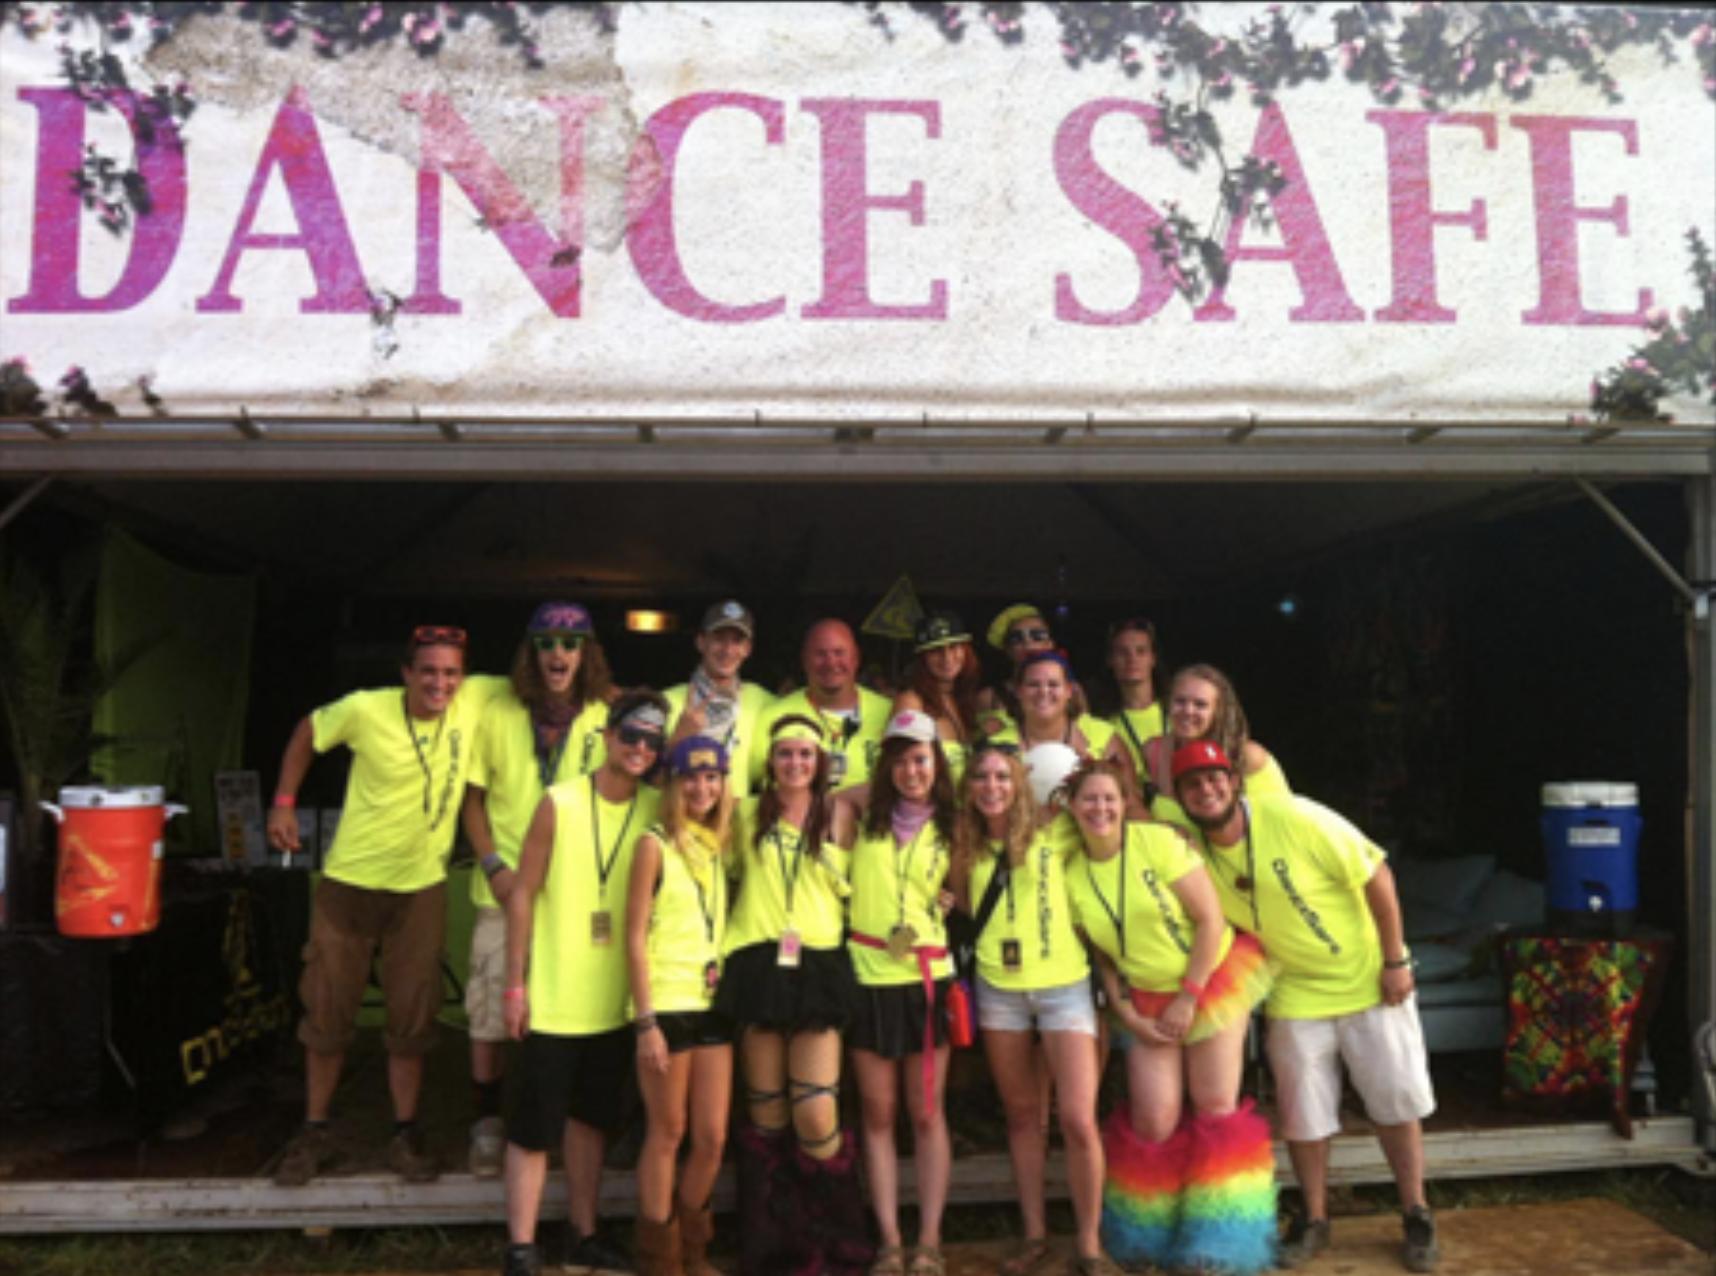 DanceSafe volunteers provide health services.